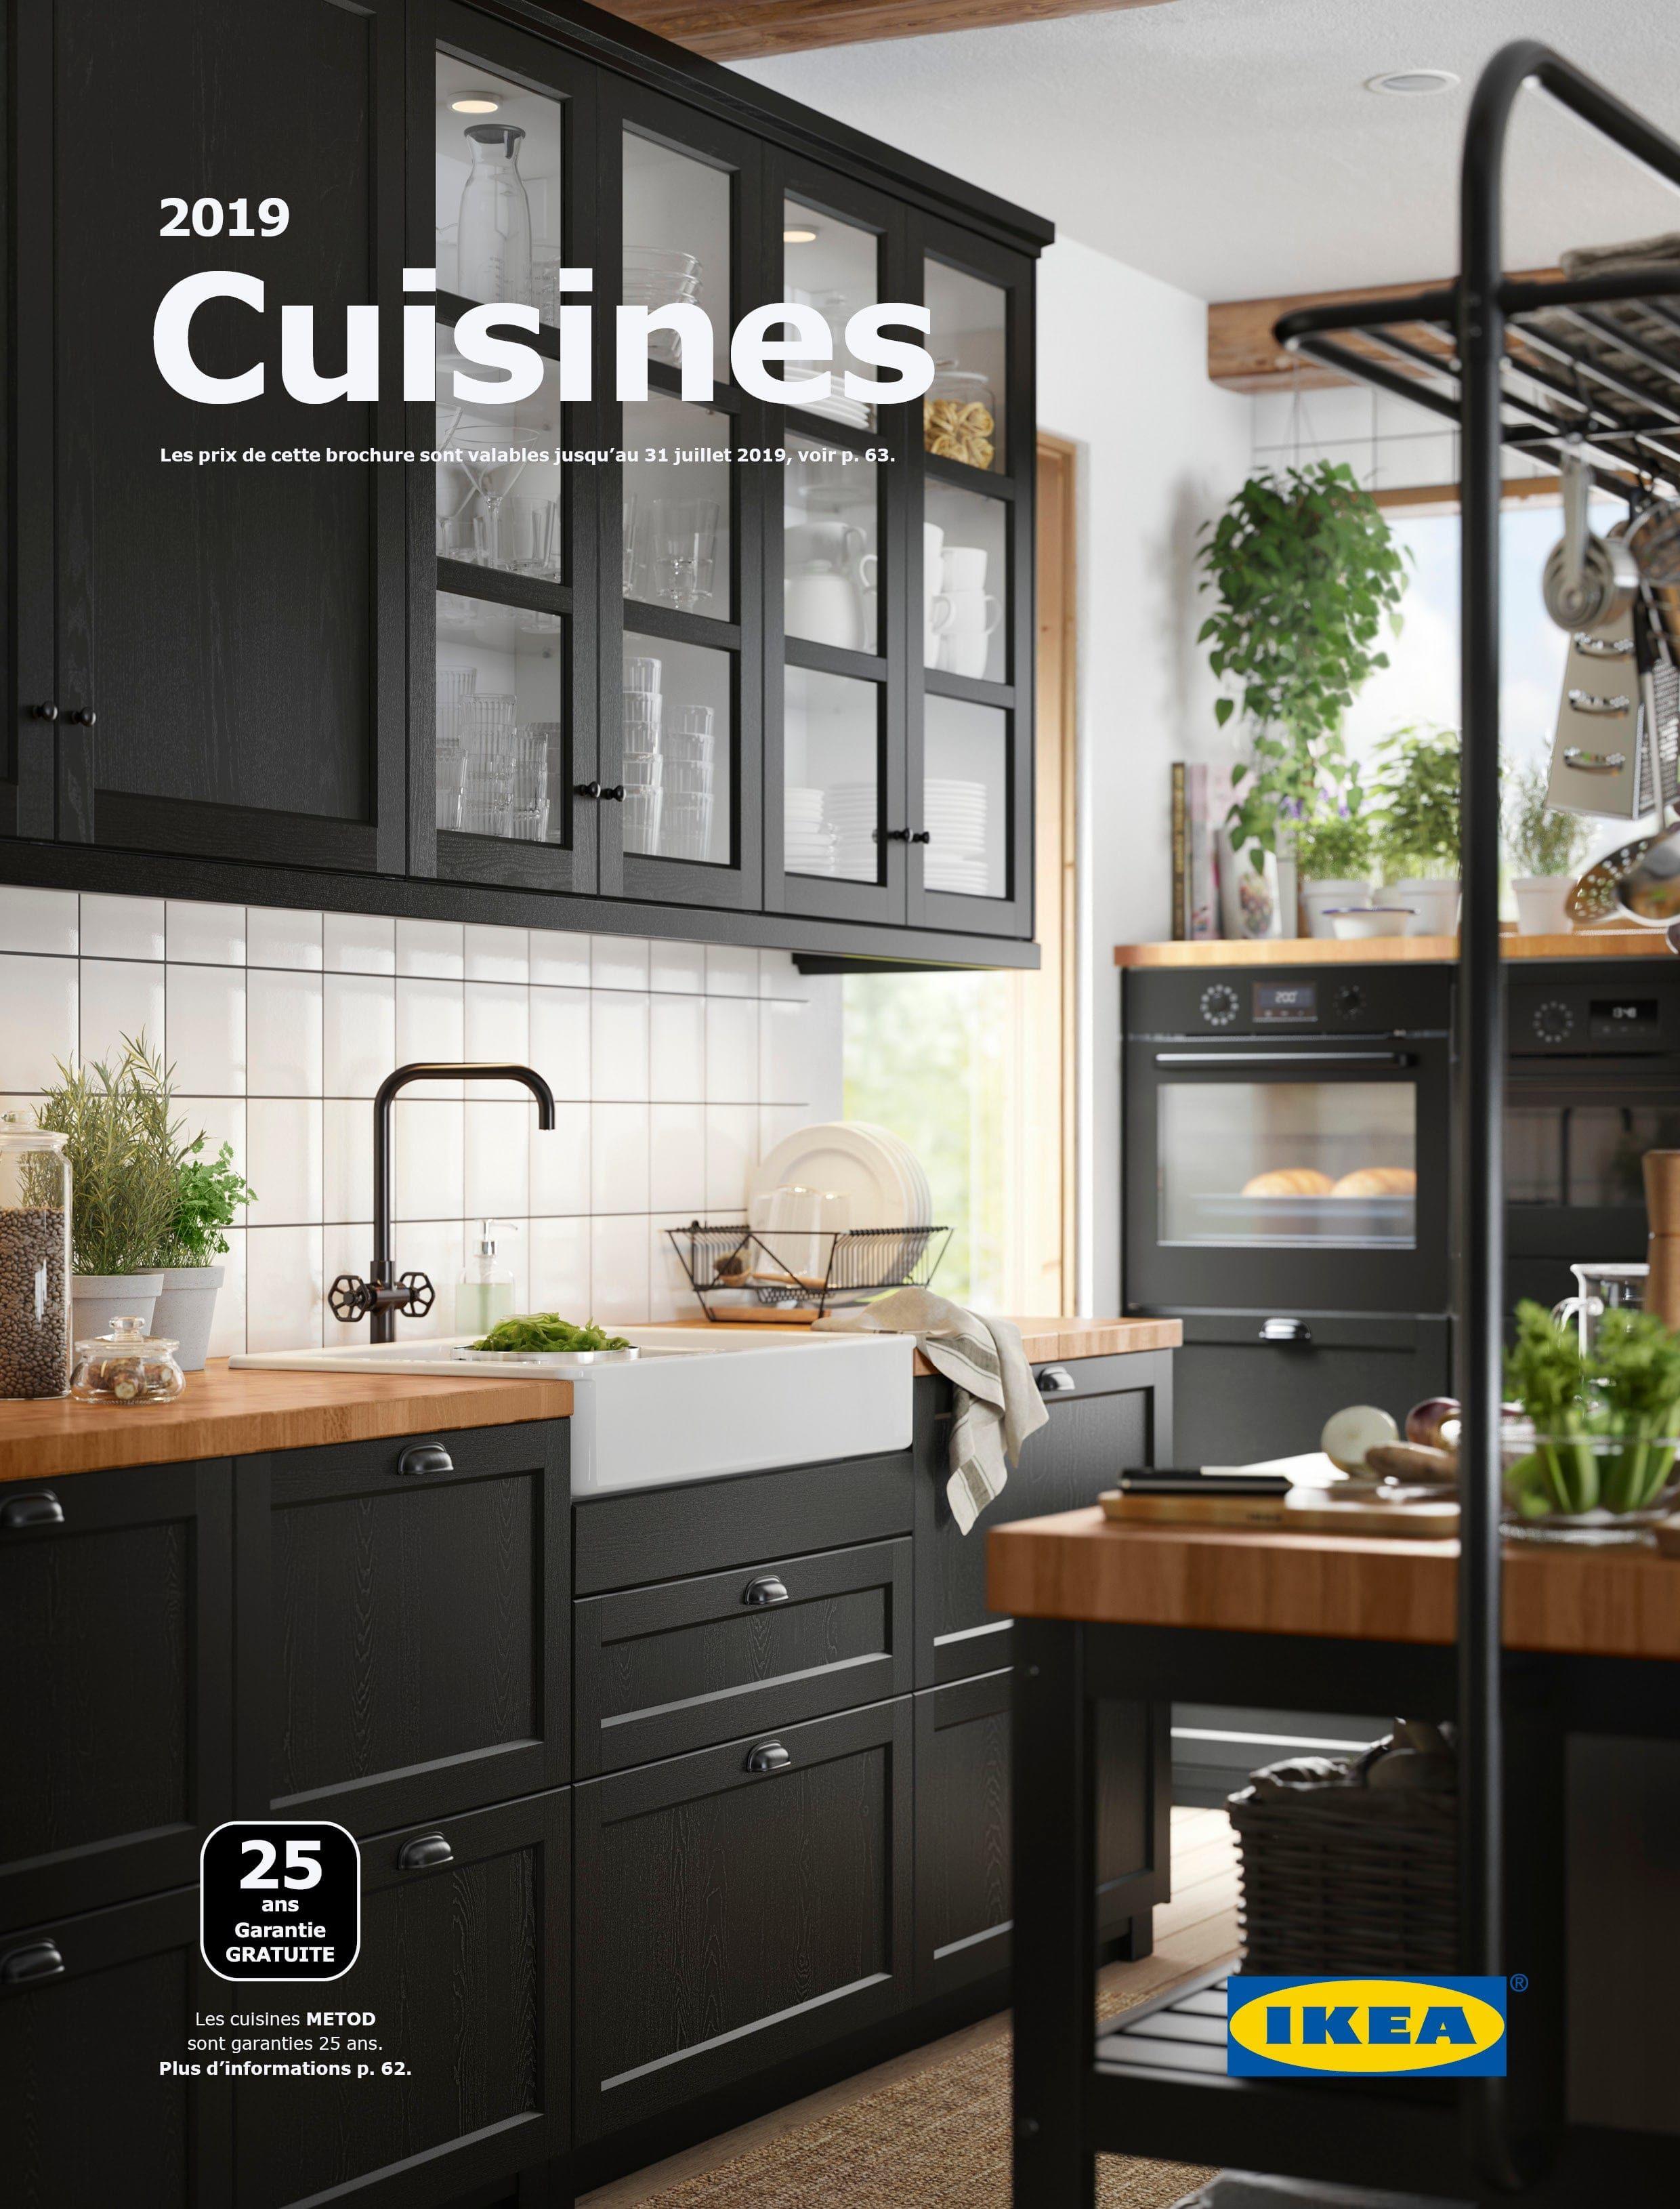 Brochure Cuisines 2019 Ikea Idee Deco Cuisine Amenagement